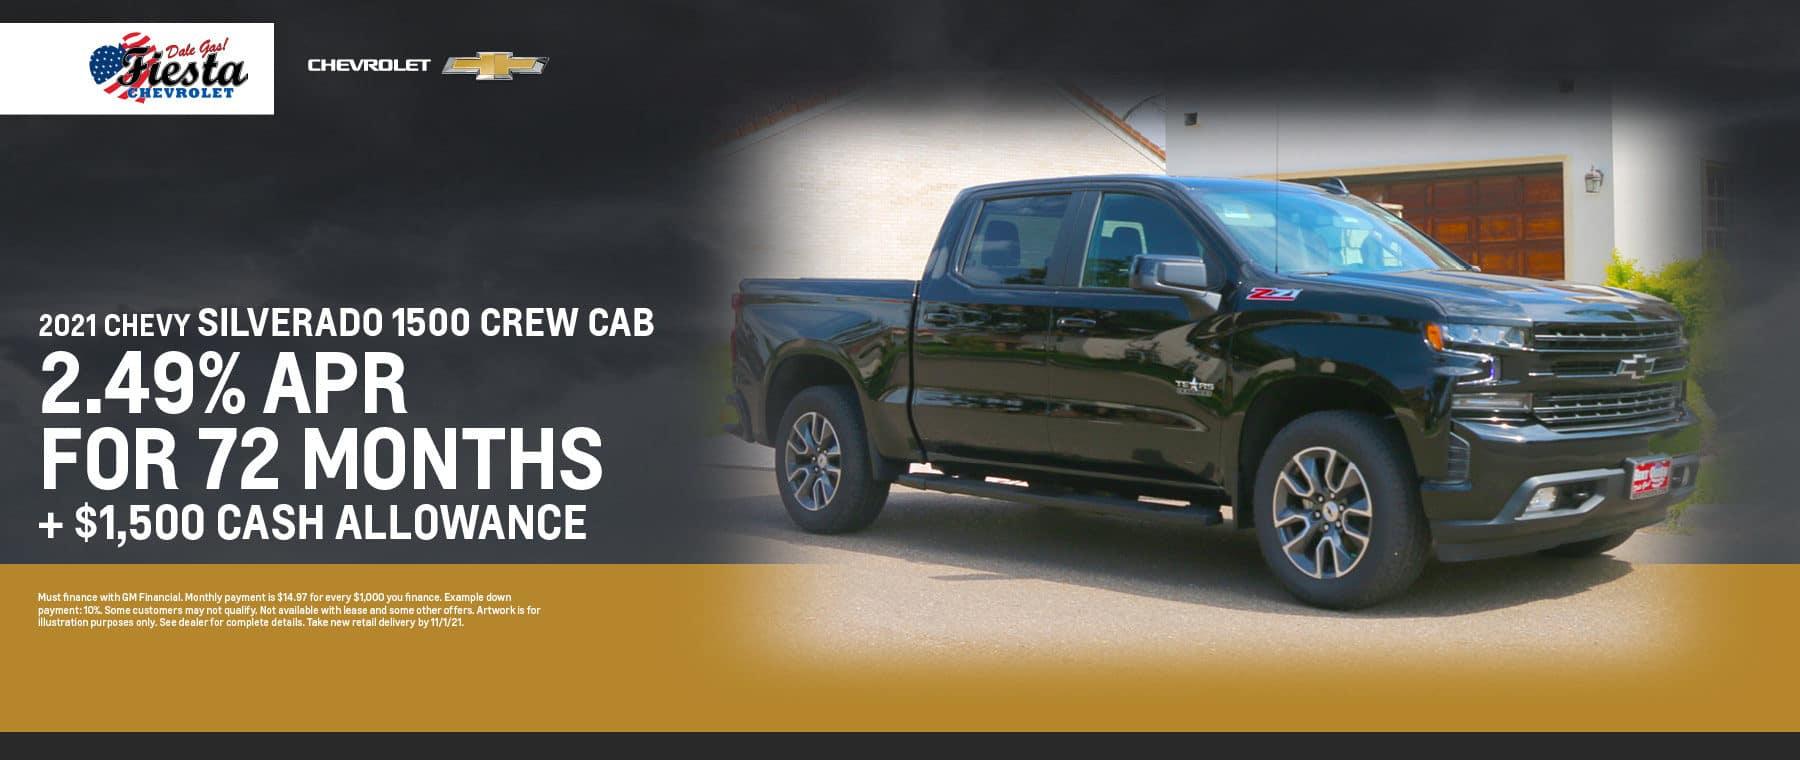 2021 Chevrolet Silverado 1500 Crew Cab Offer   Fiesta Chevrolet in Edinburg, Texas